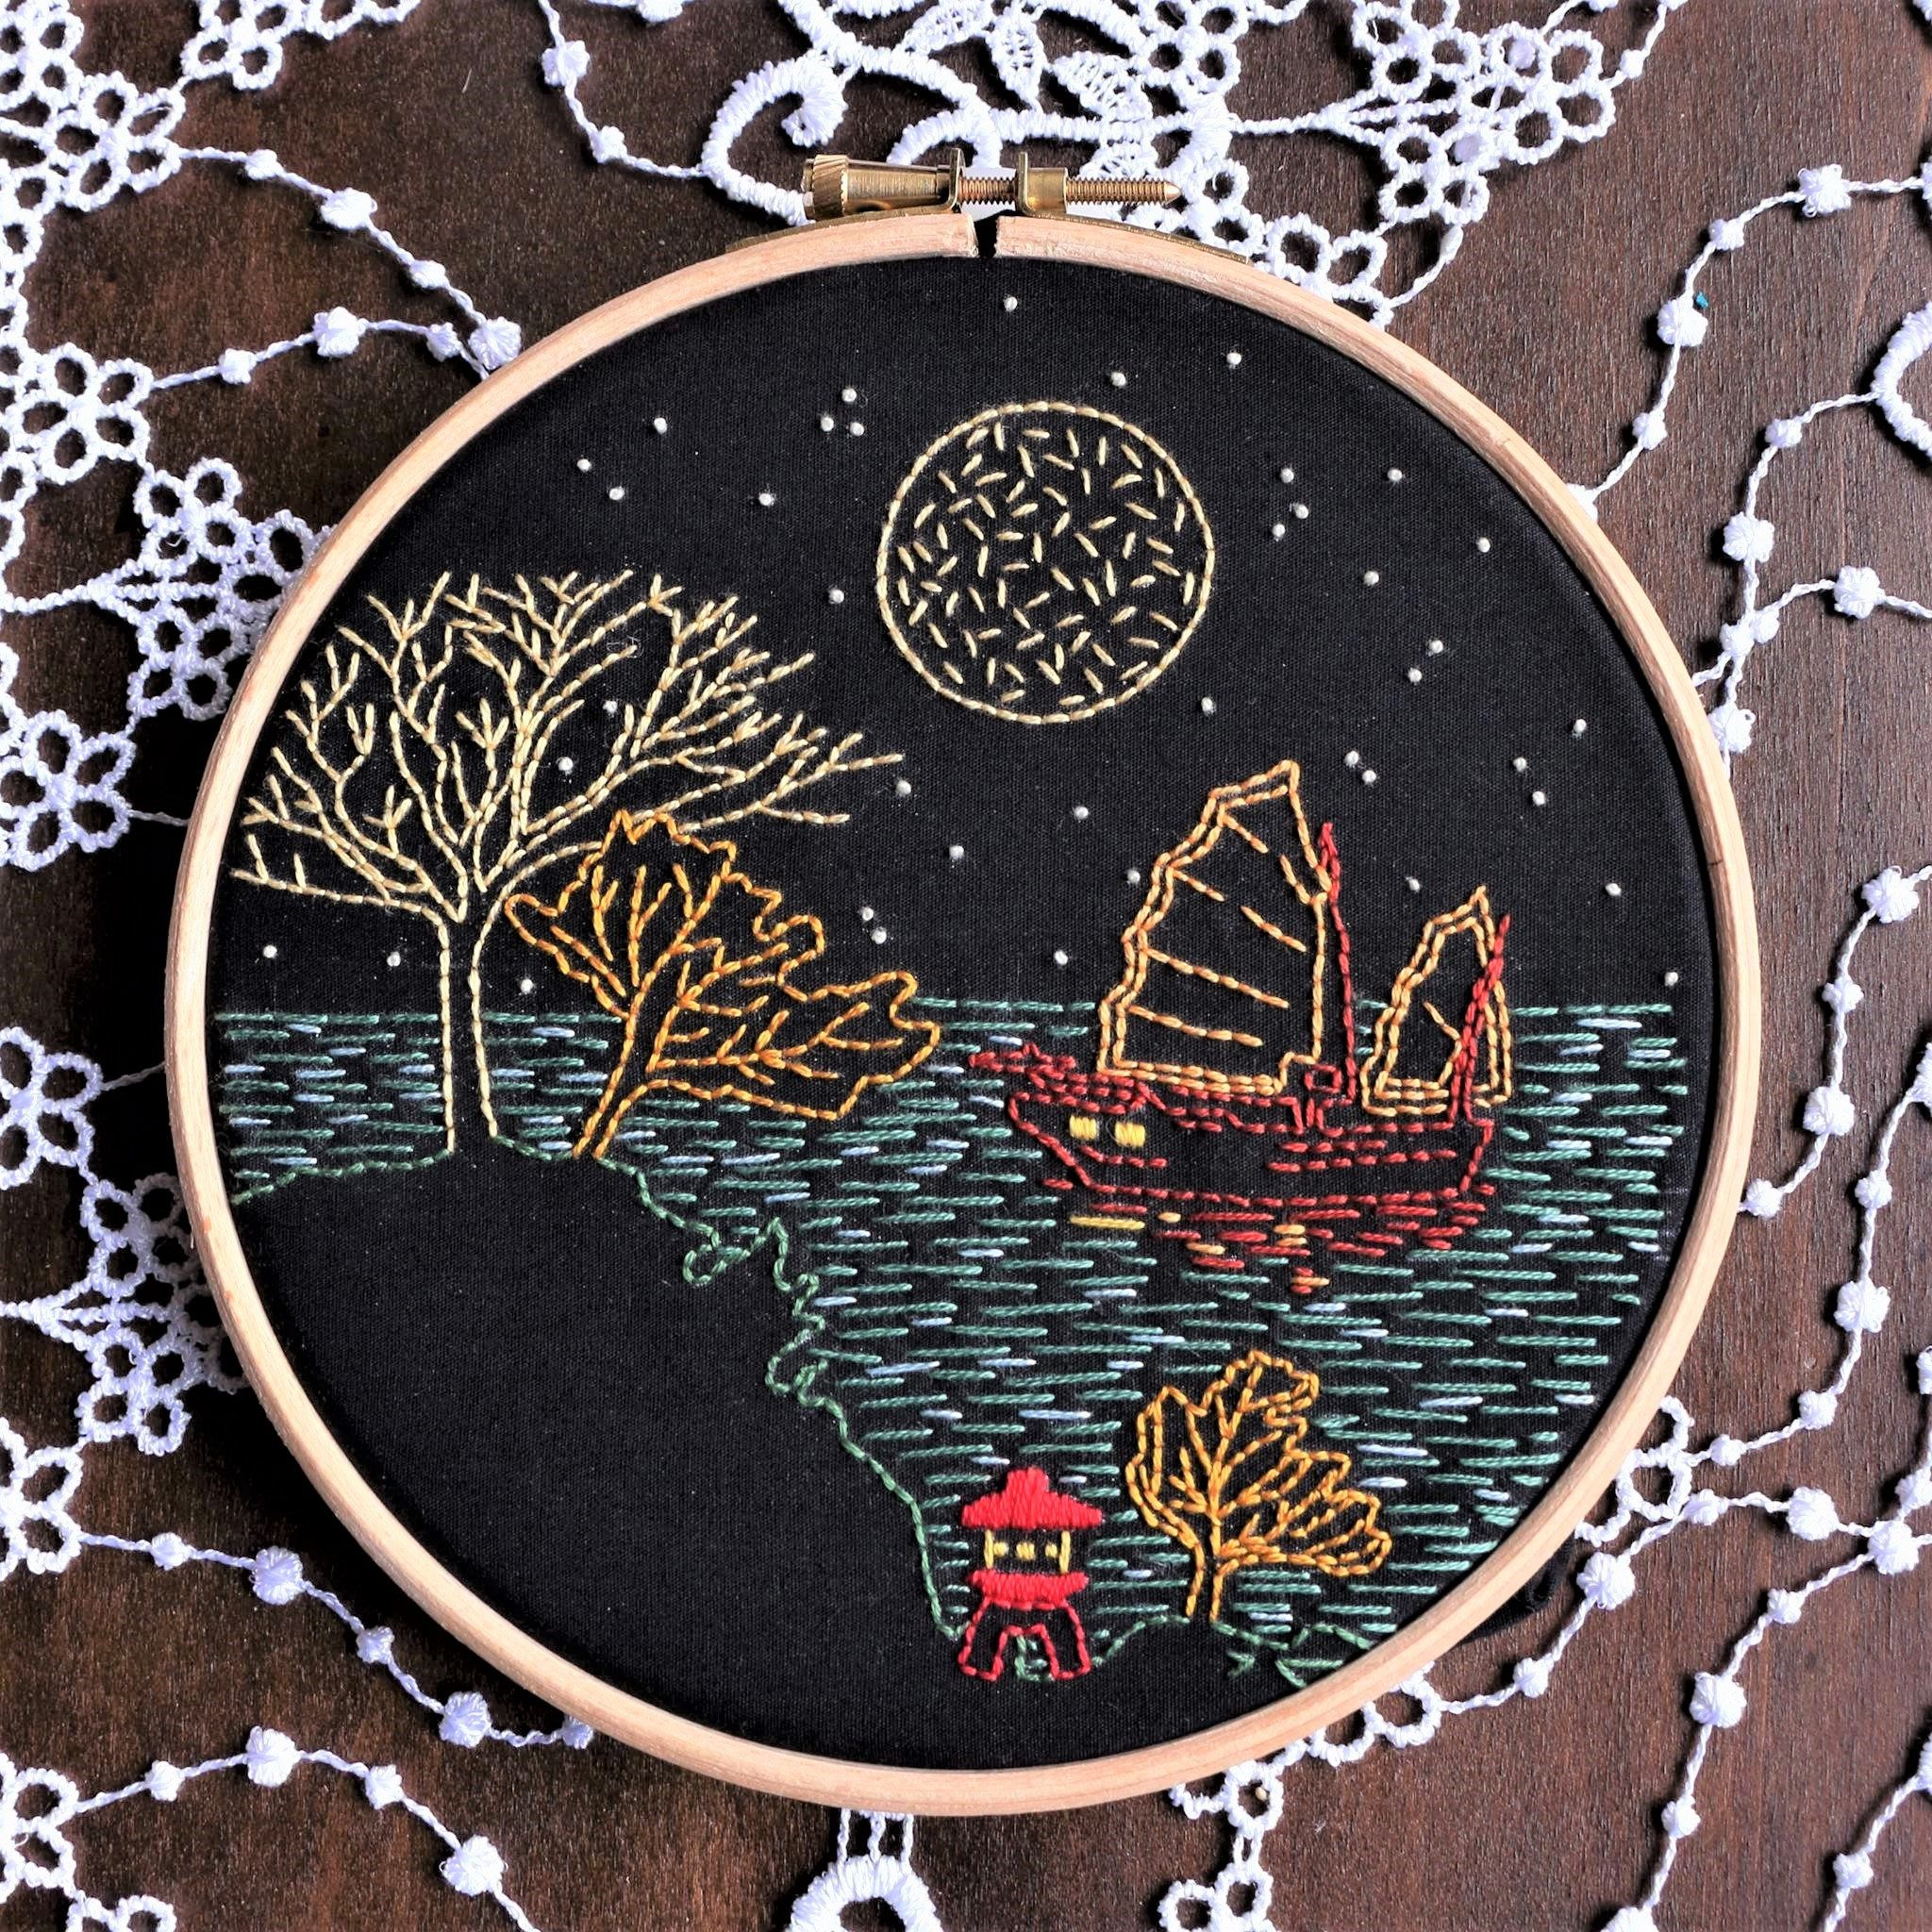 Moonlight design Gift for lovers Hand Embroidery kit  on purple fabric beginner needlepoint kit Embroidery pattern Modern hoop art